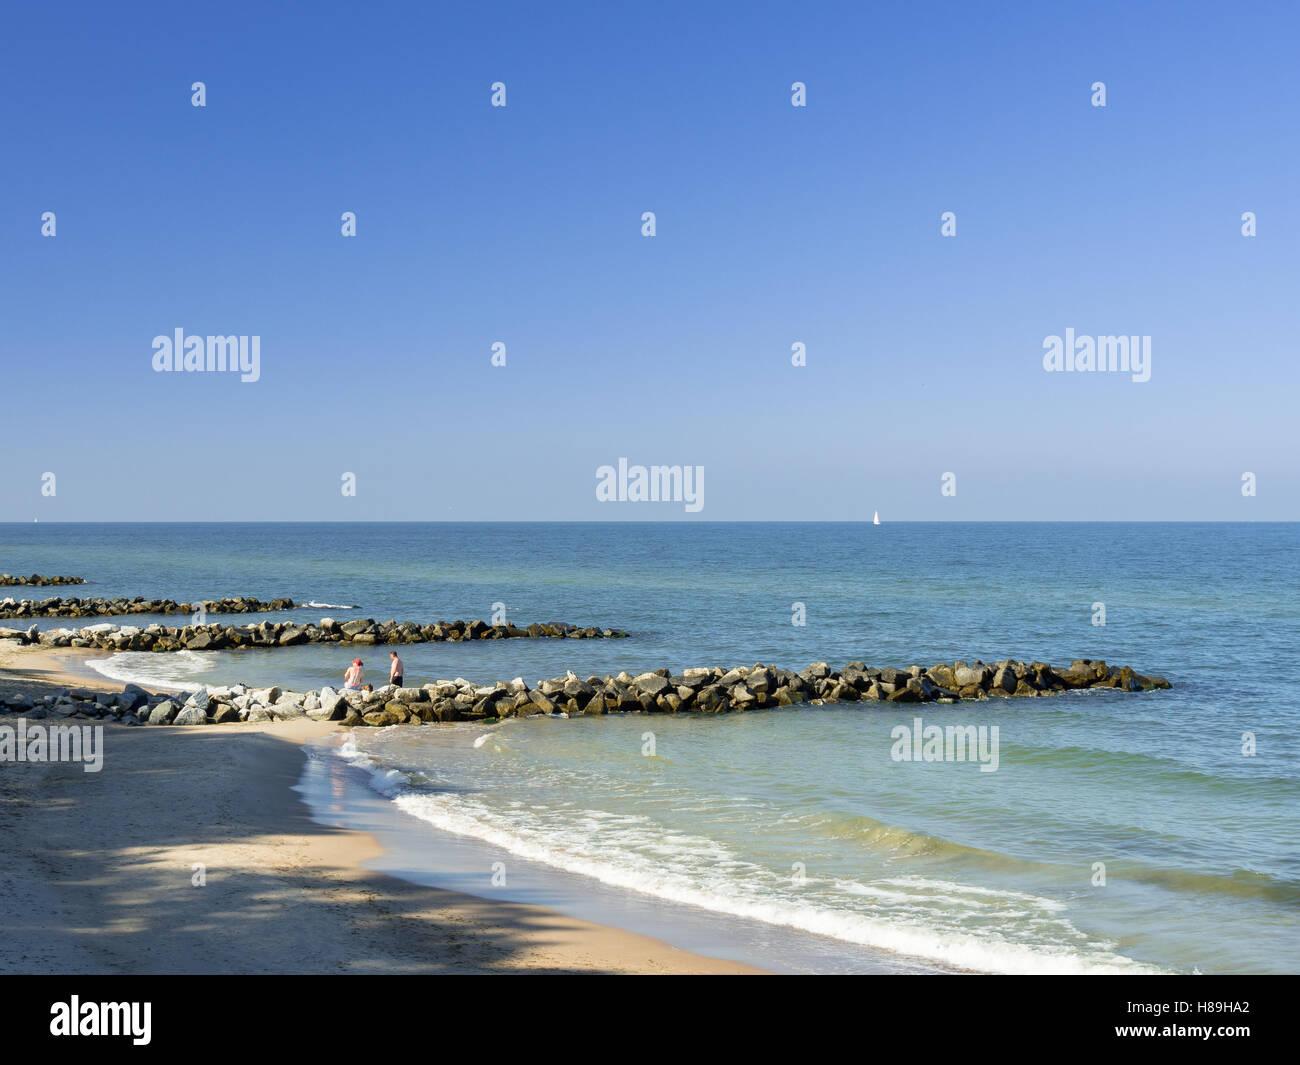 Stone breakwaters. - Stock Image